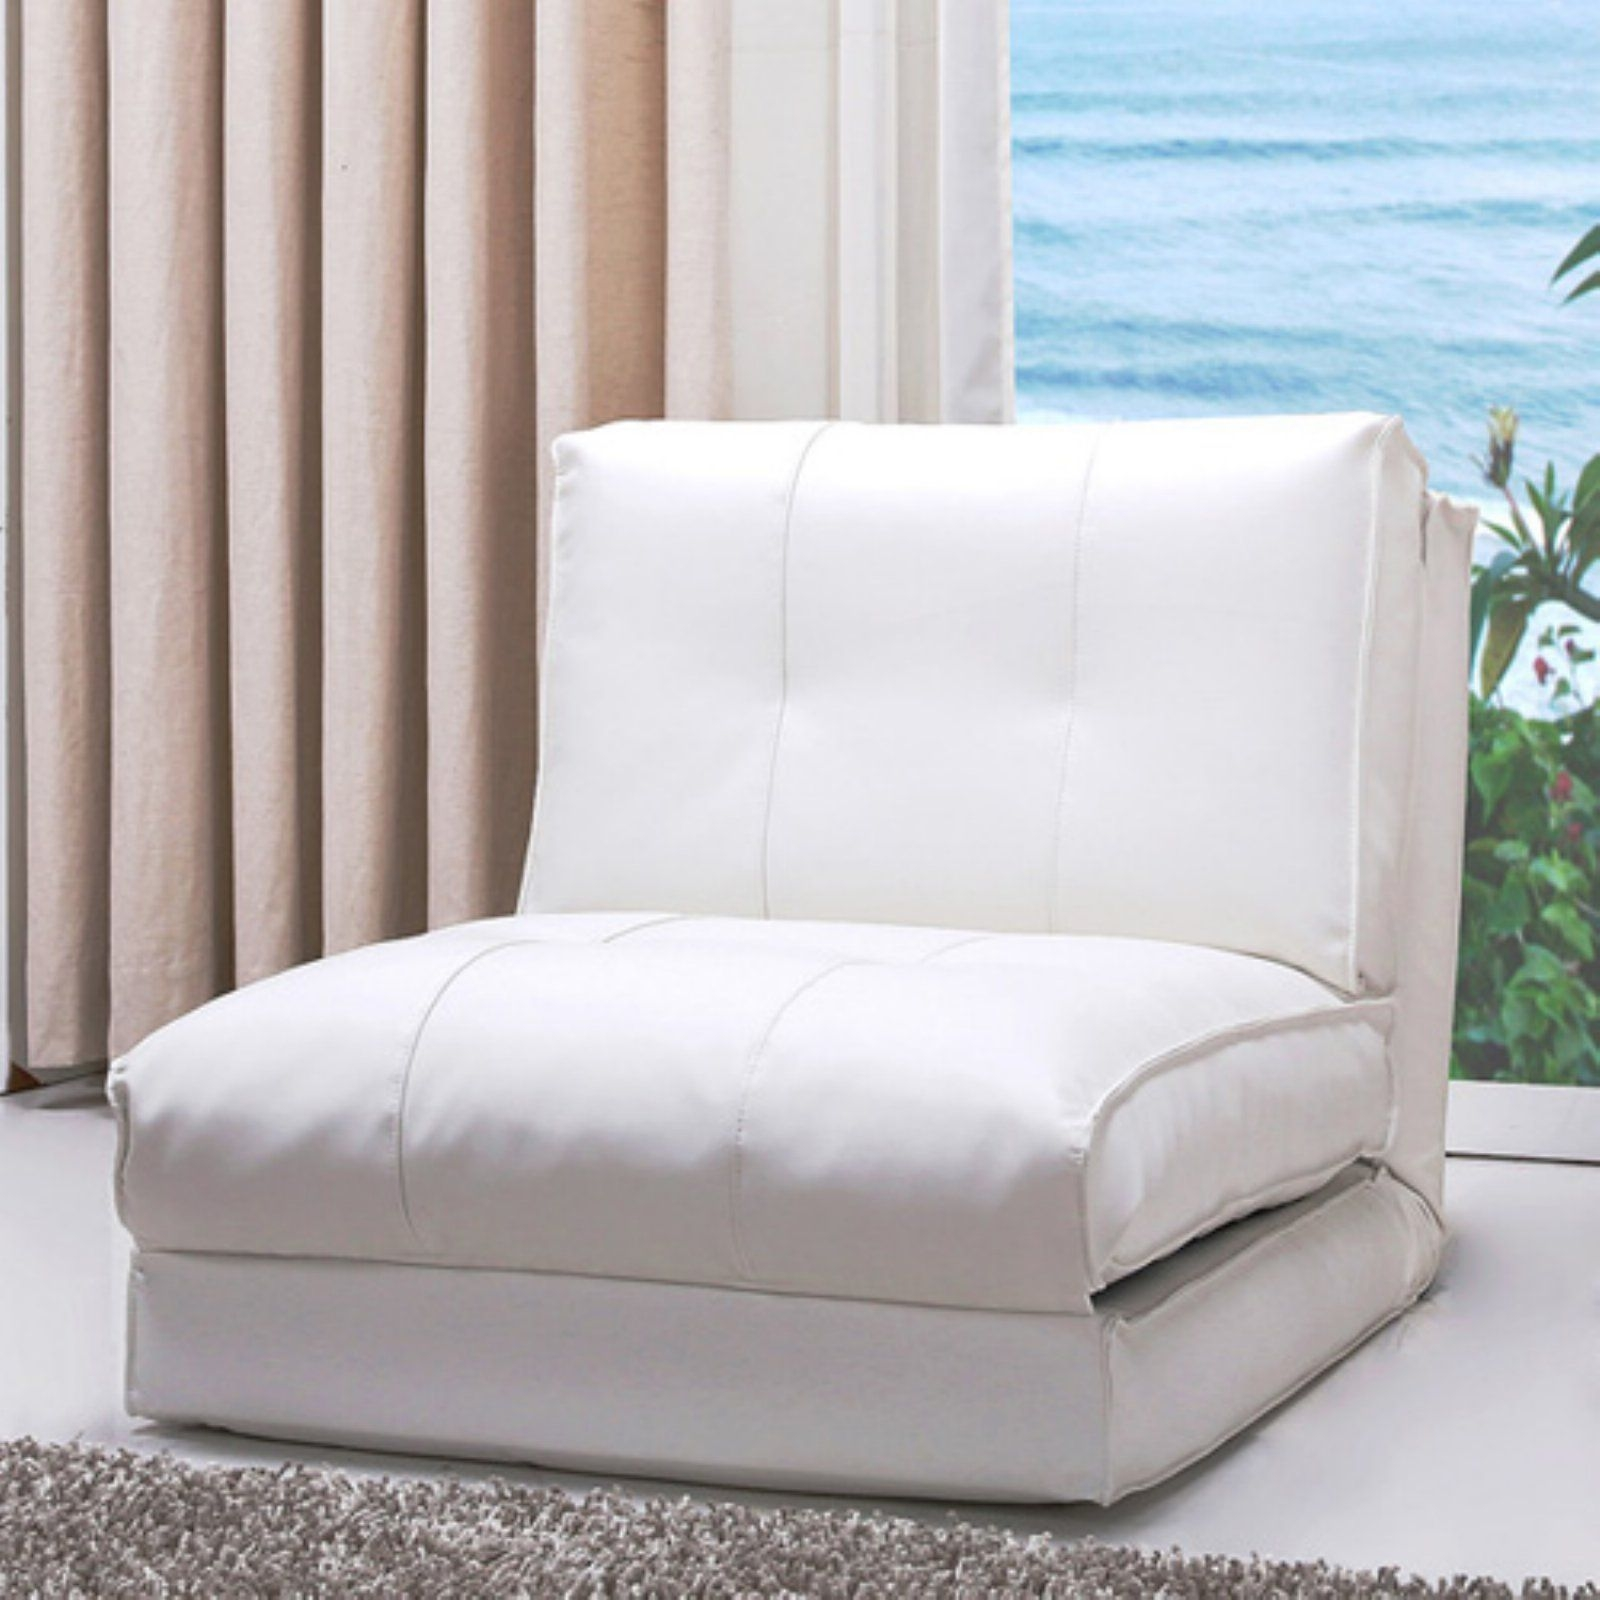 Single Sofa Bed Chair Single Sofa Bed Chair